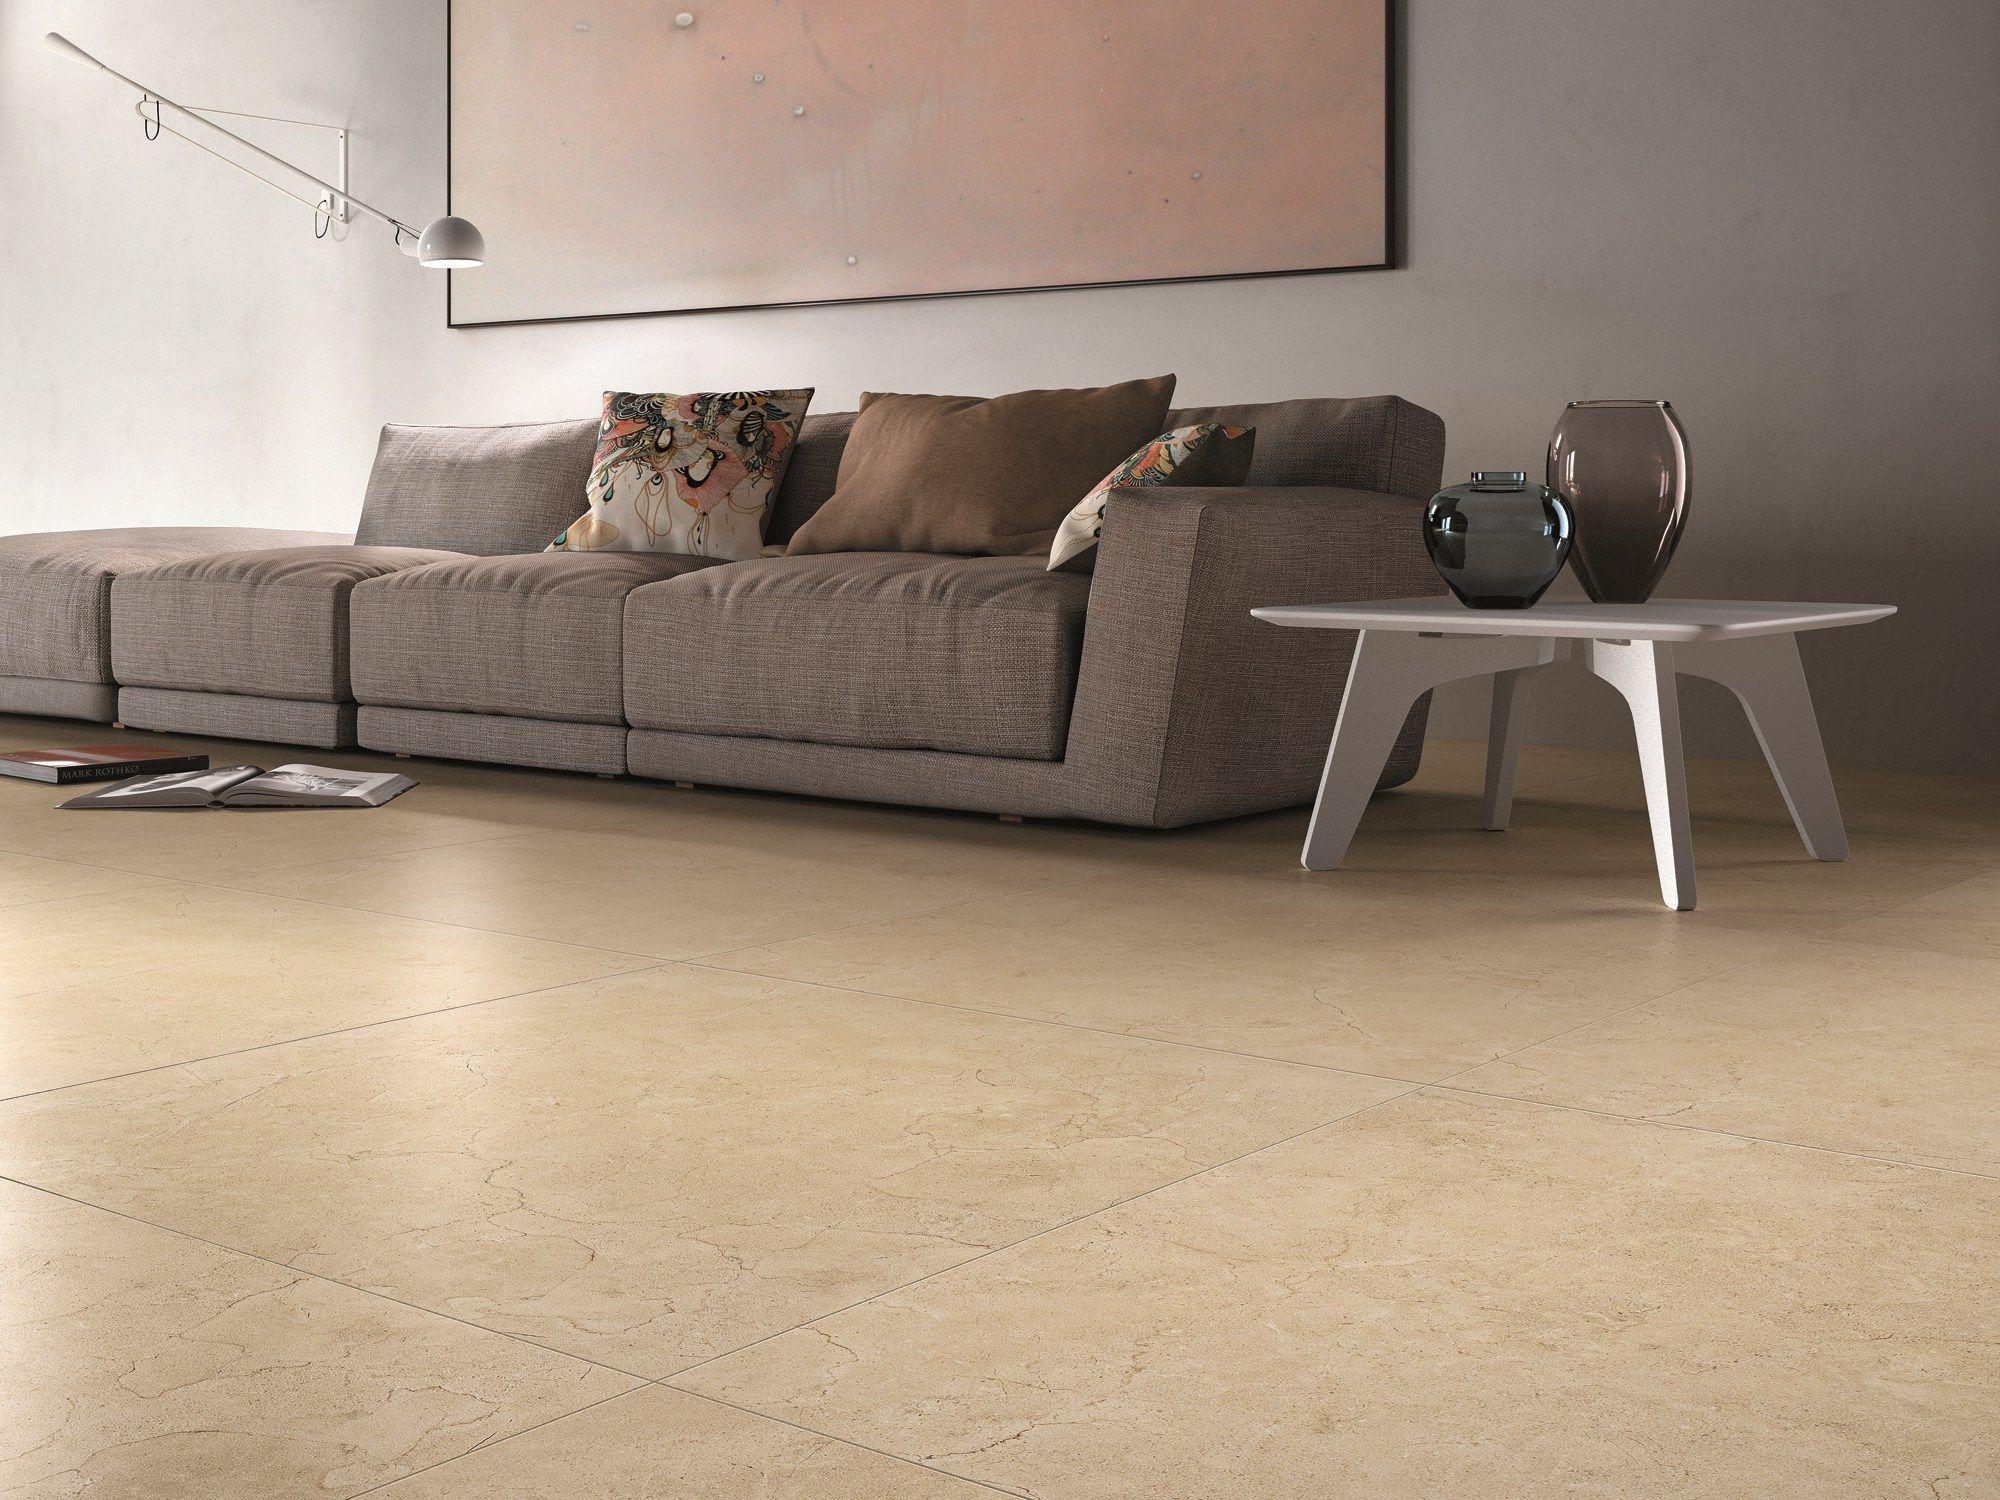 Pavimento/rivestimento in gres laminato effetto marmo EXEDRA by COTTO D'ESTE